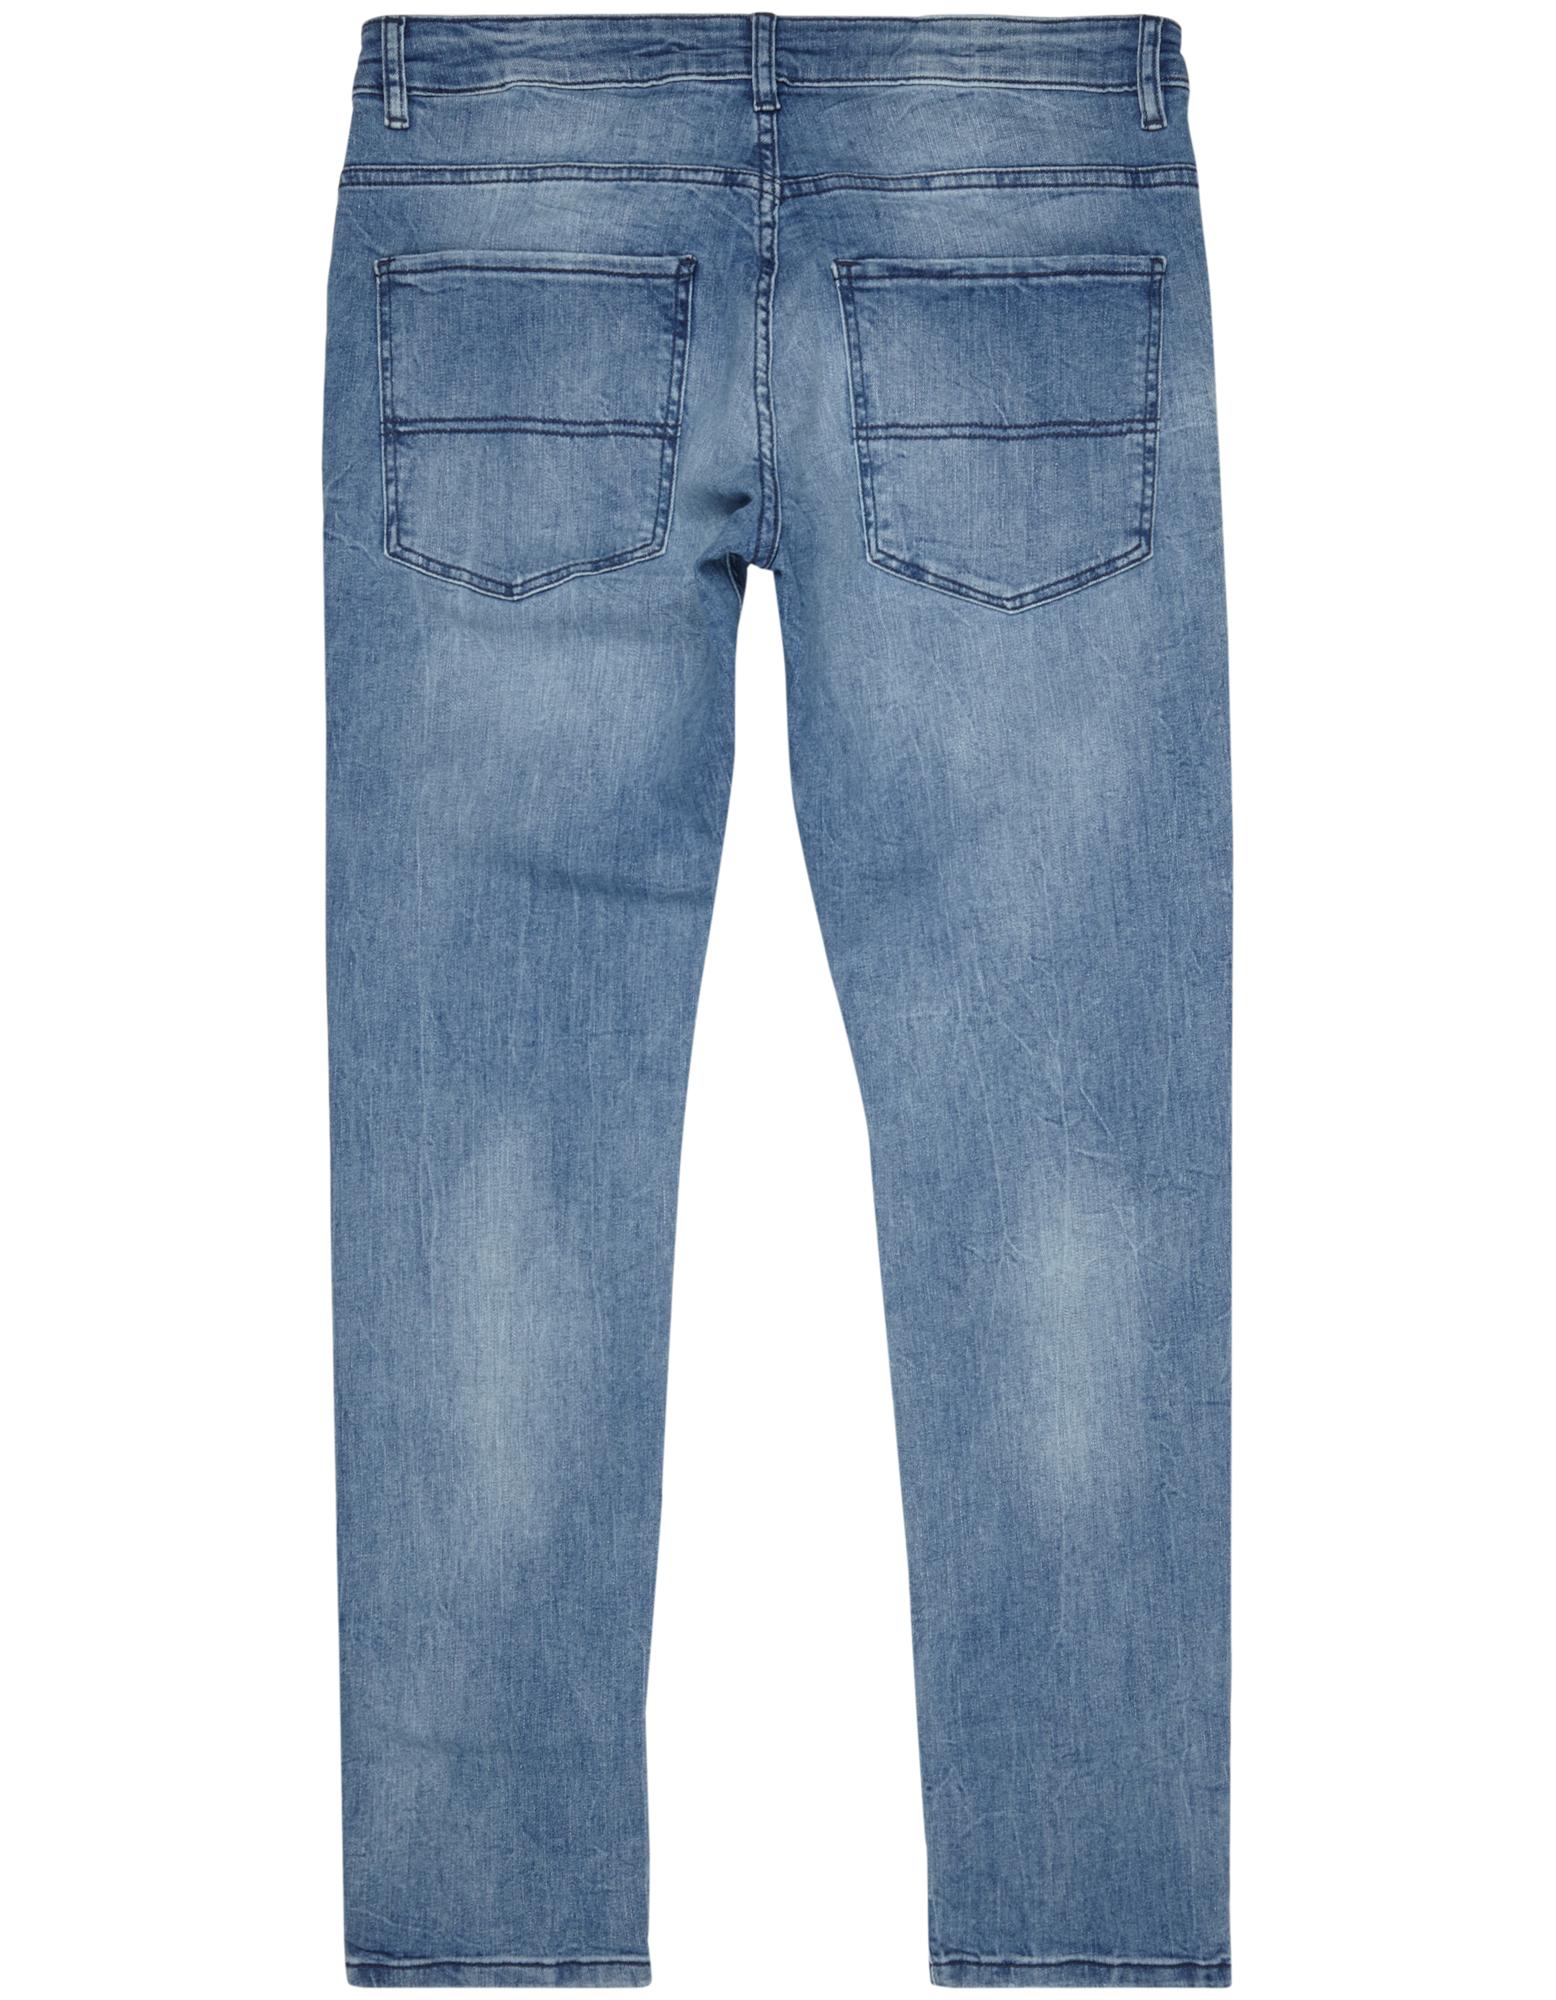 herren skinny fit jeans im used look takko fashion. Black Bedroom Furniture Sets. Home Design Ideas